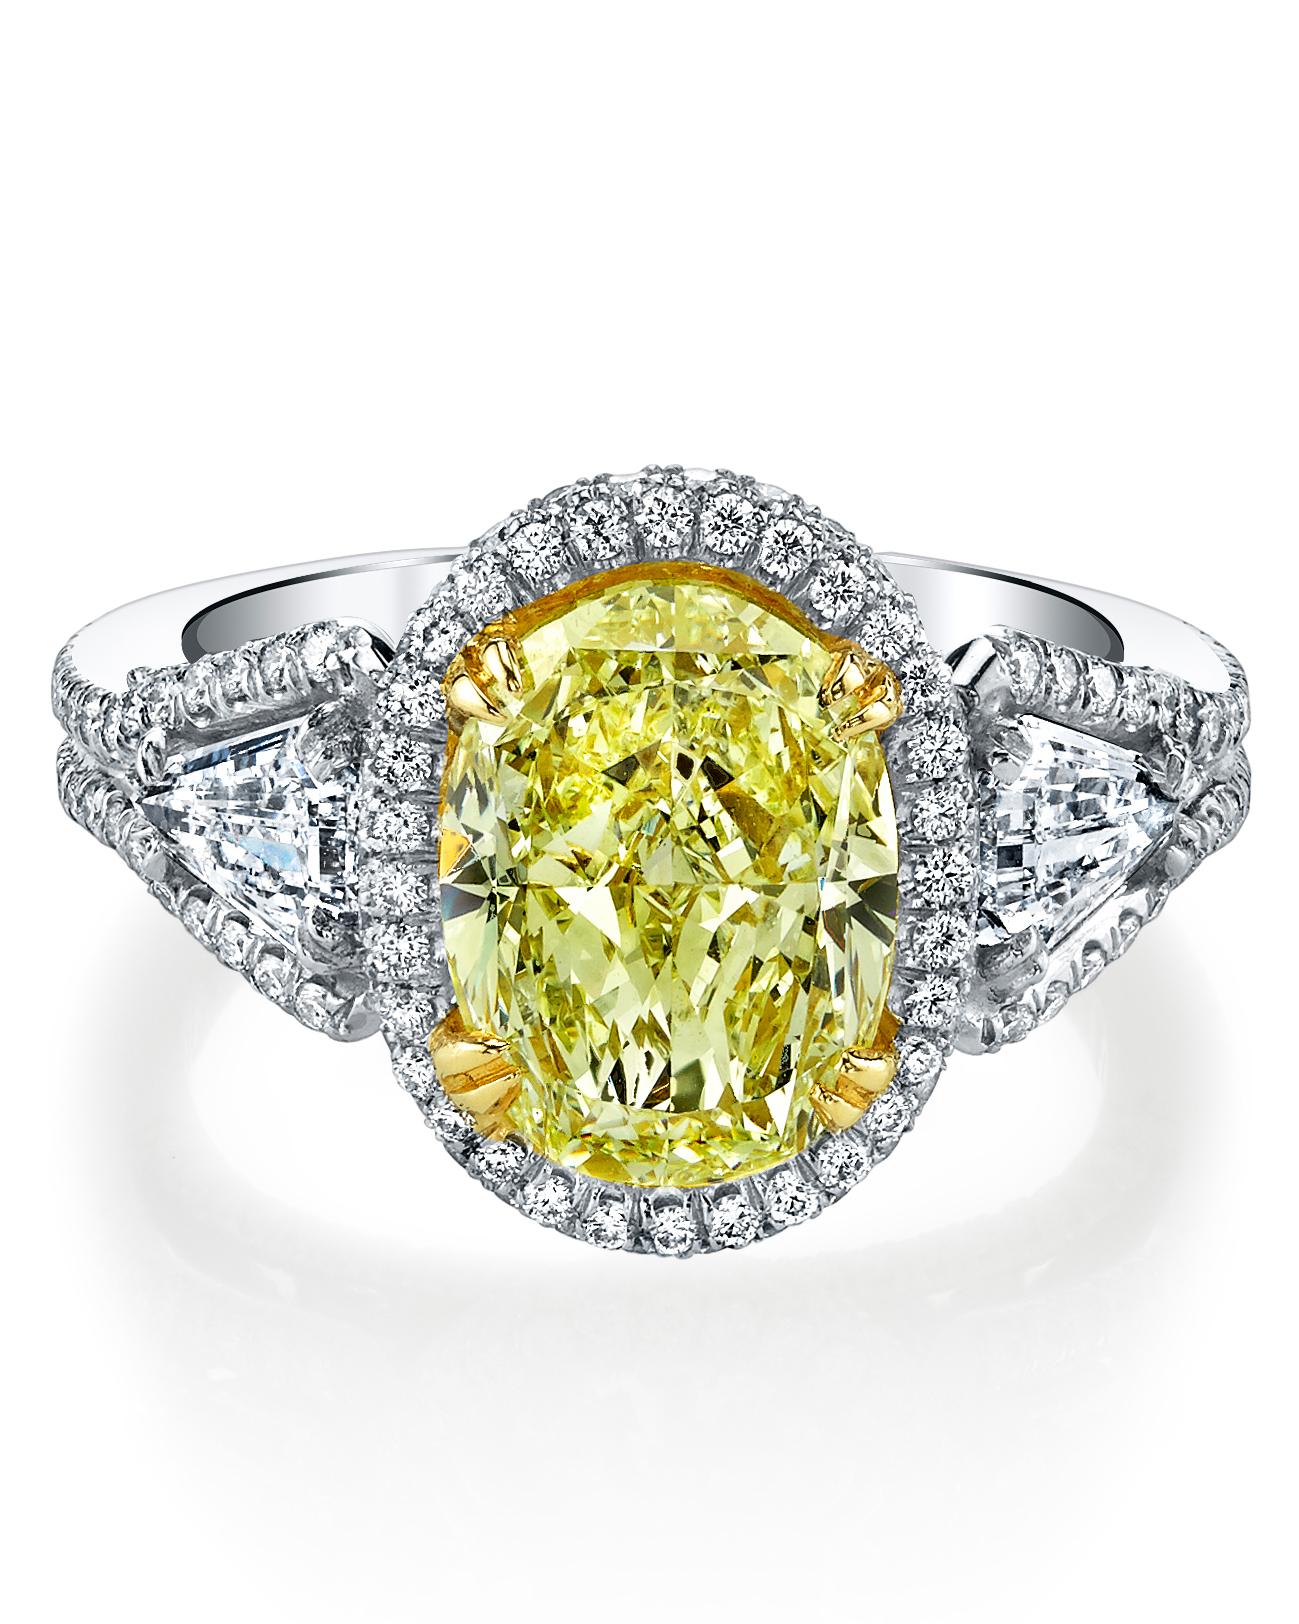 oval-cut-engagement-ring-harry-kotlar-0714.jpg